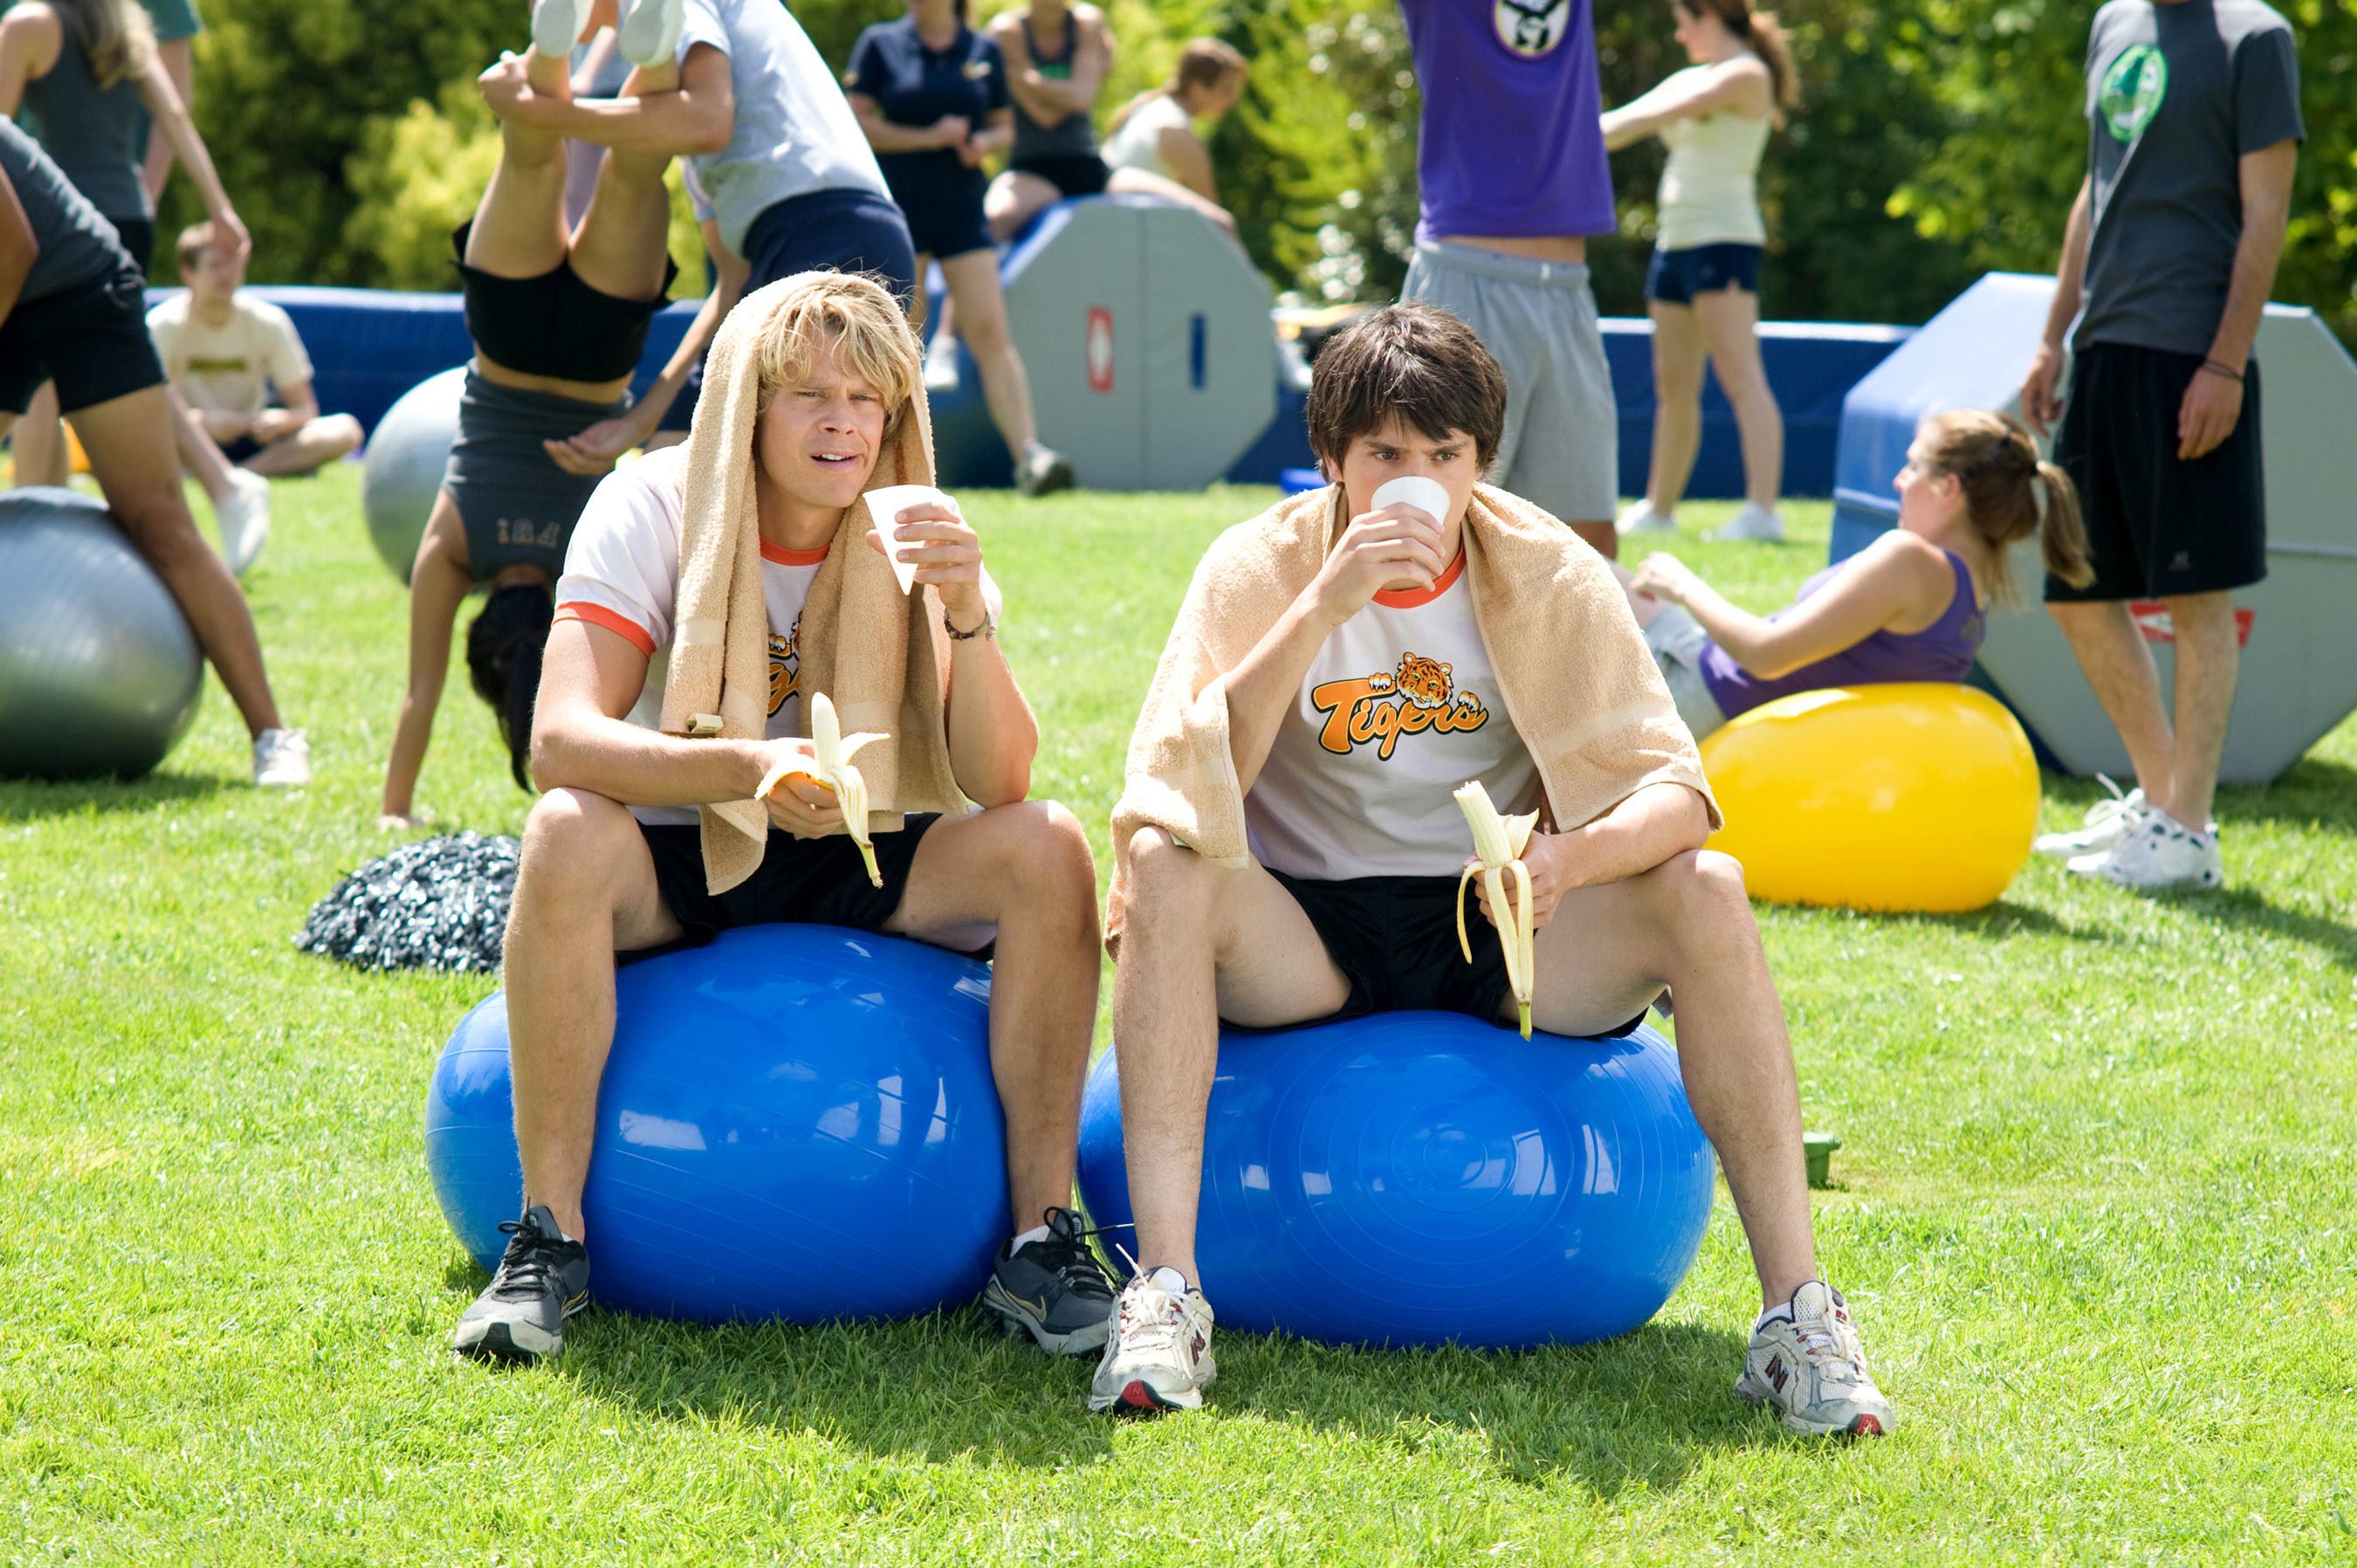 Eric Christian Olsen and Nicholas D'Agosto sitting on exercise balls